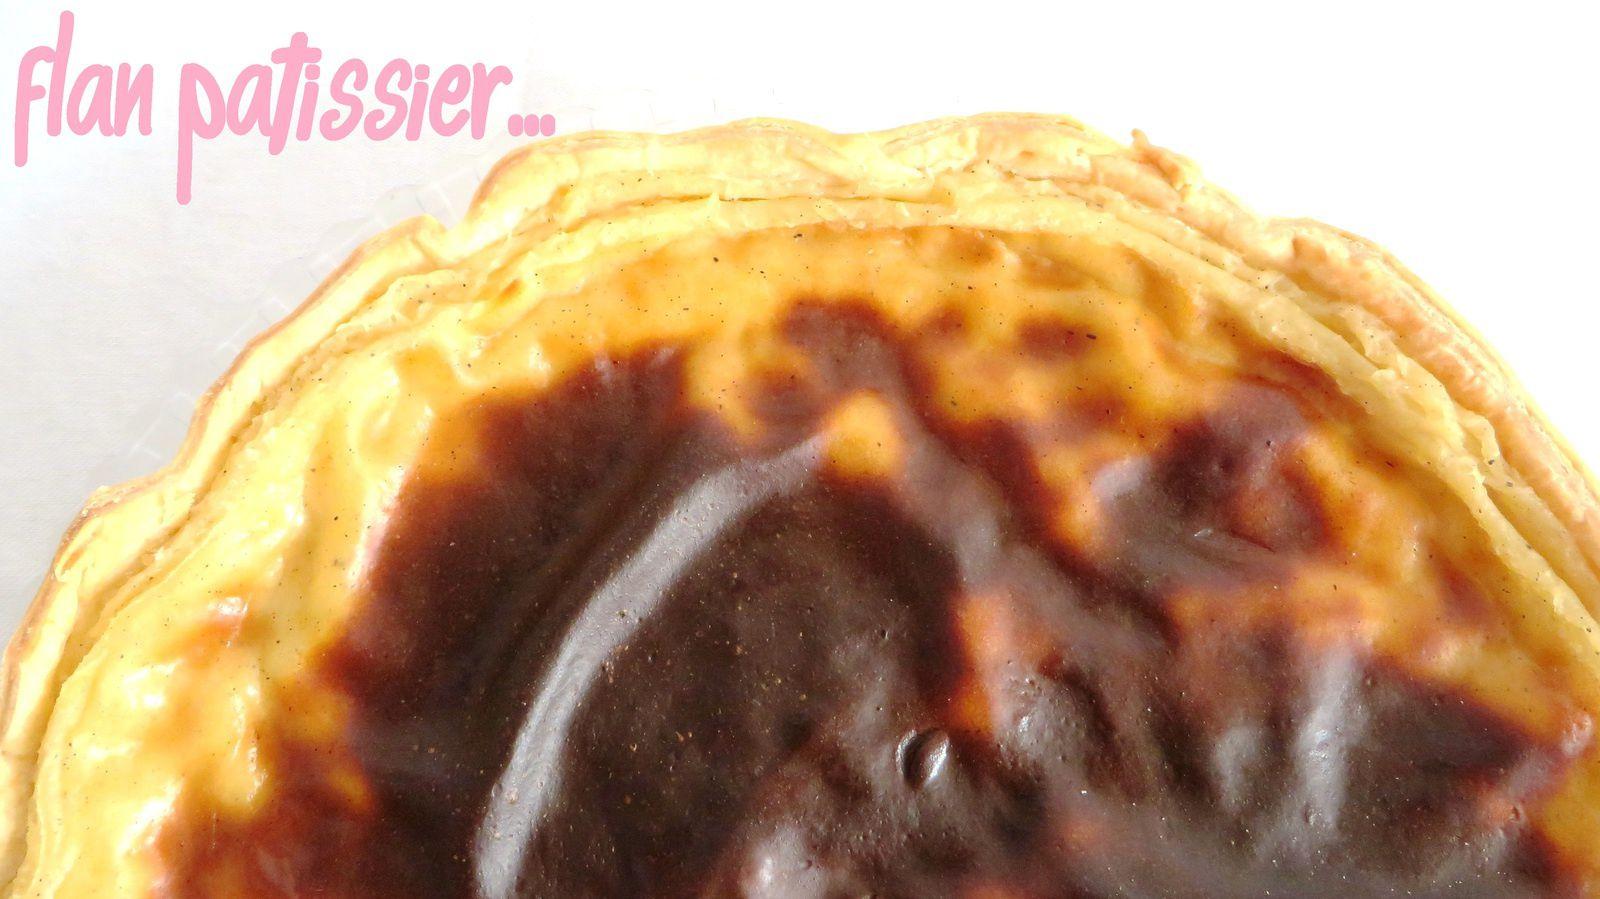 Flan pâtissier vraiment vanillé !!!